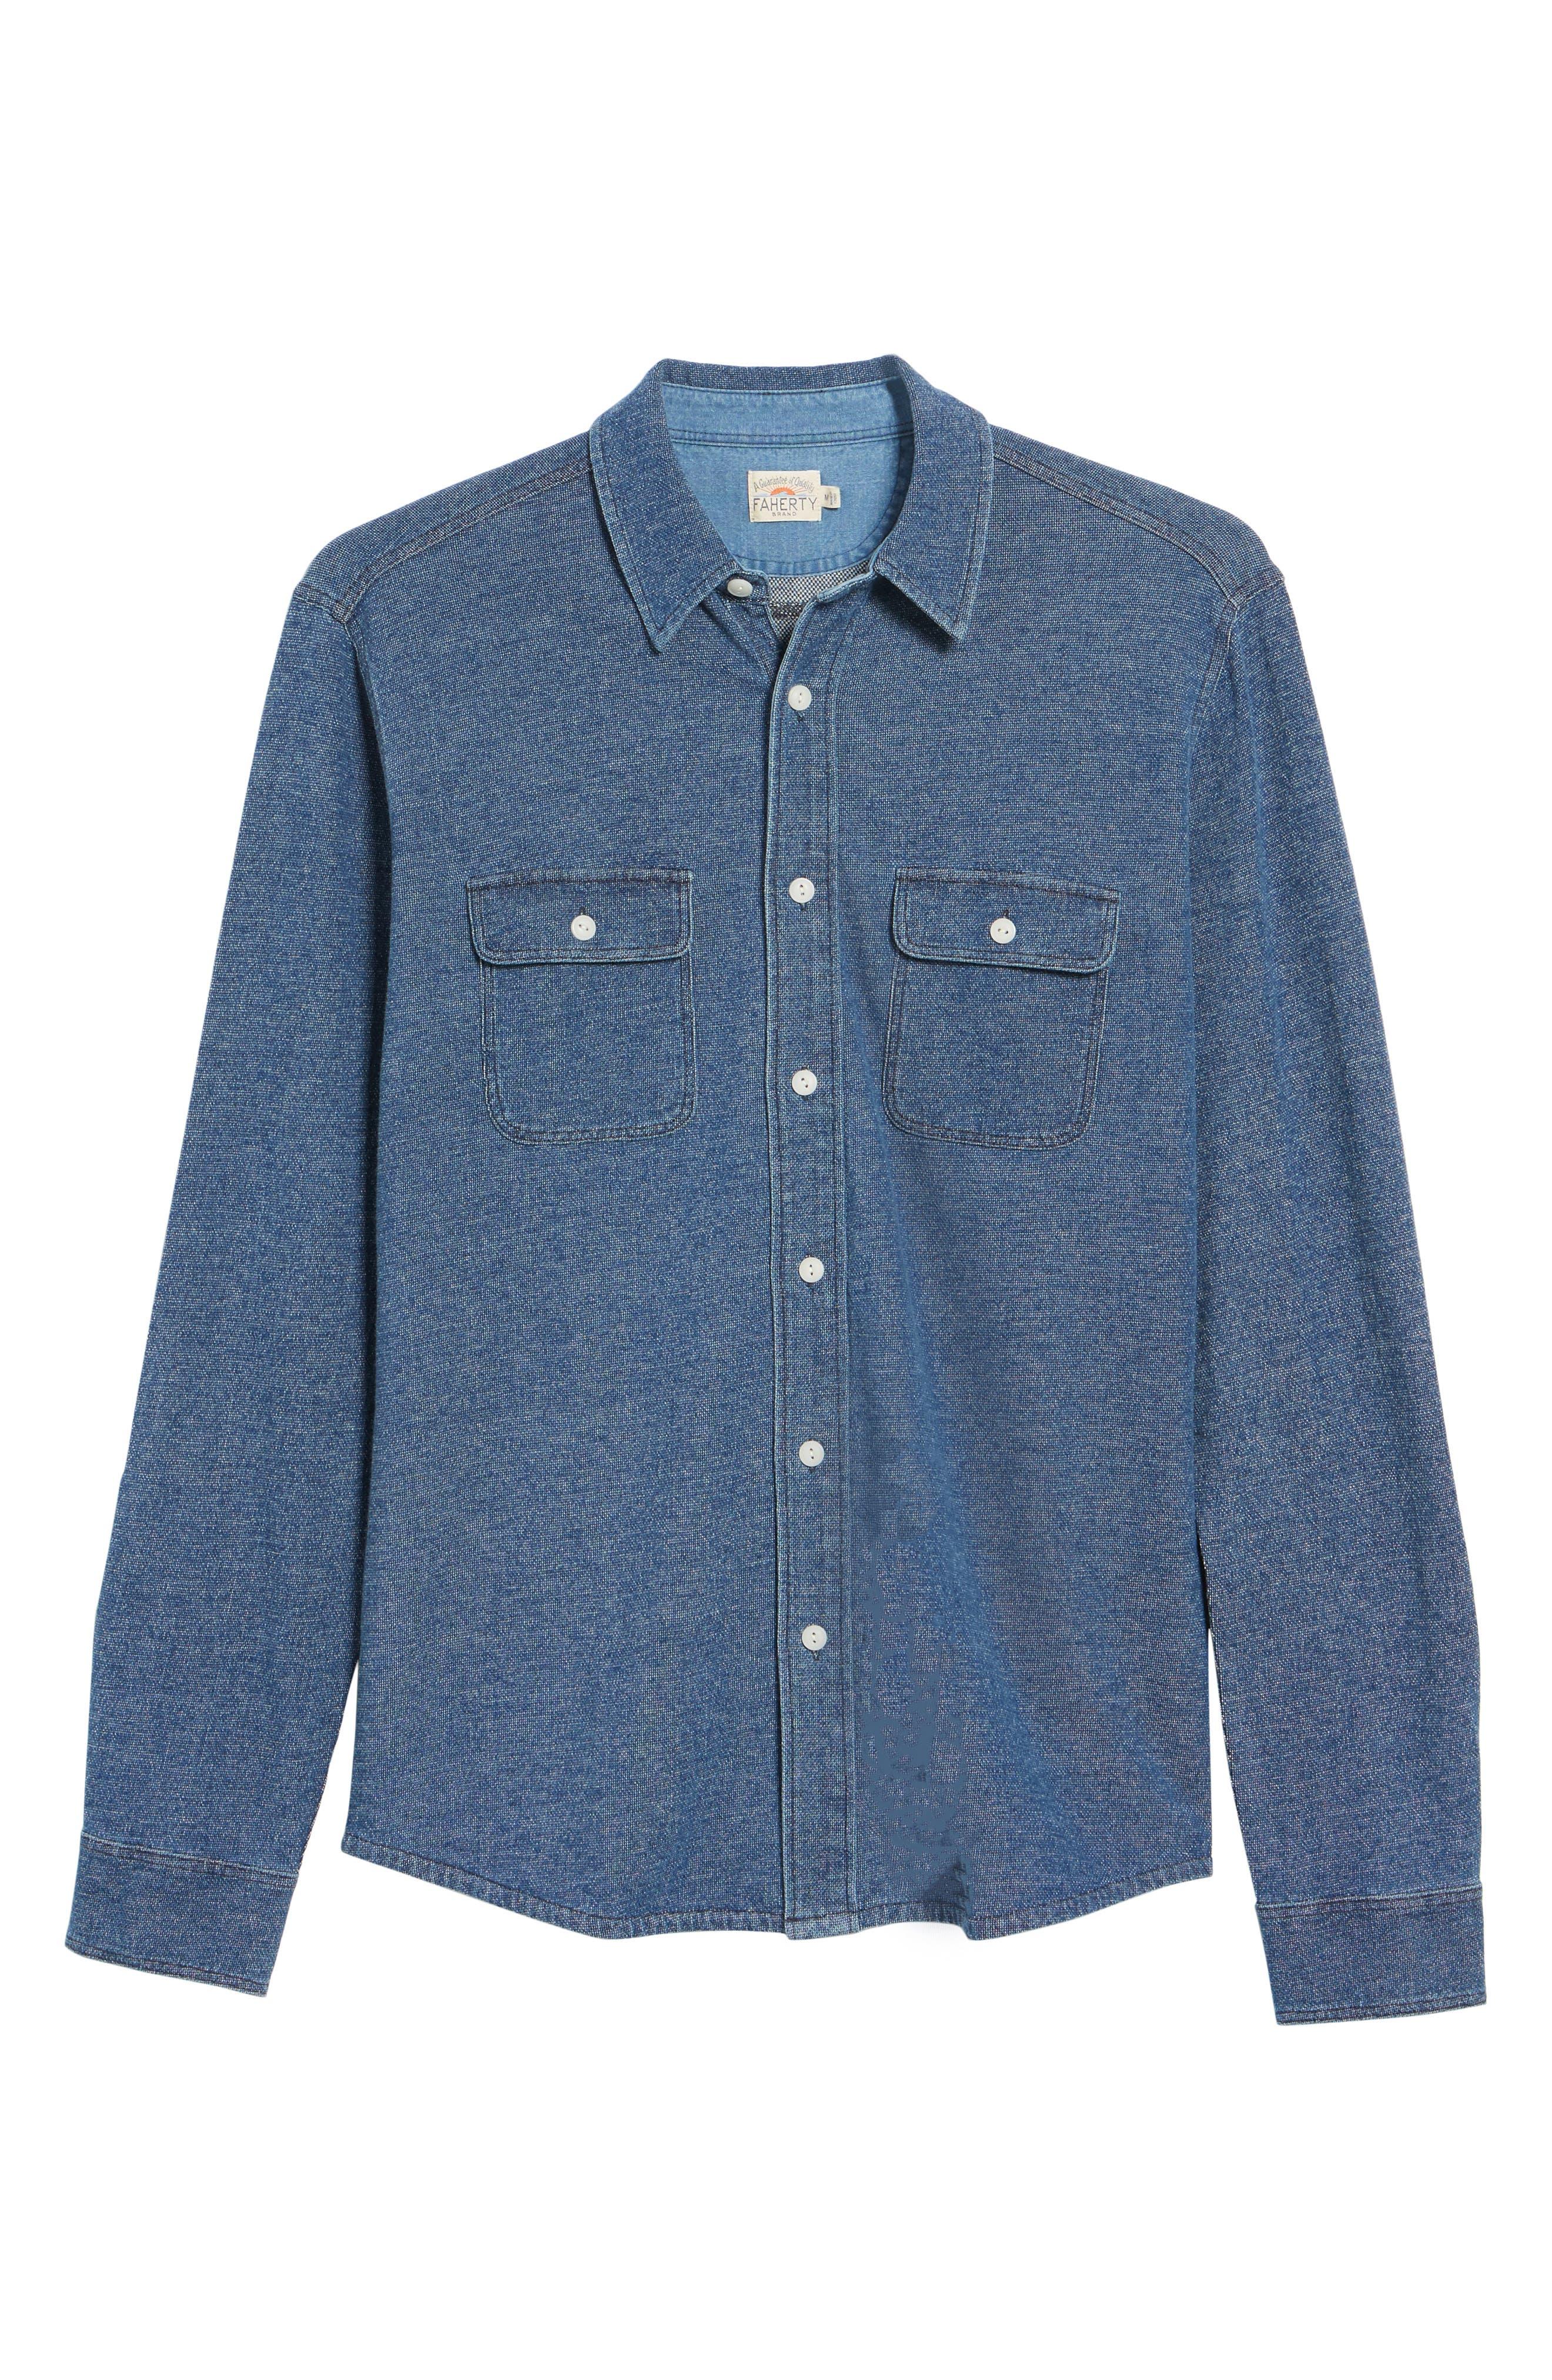 Belmar Chambray Knit Sport Shirt,                             Alternate thumbnail 6, color,                             Medium Wash Indigo